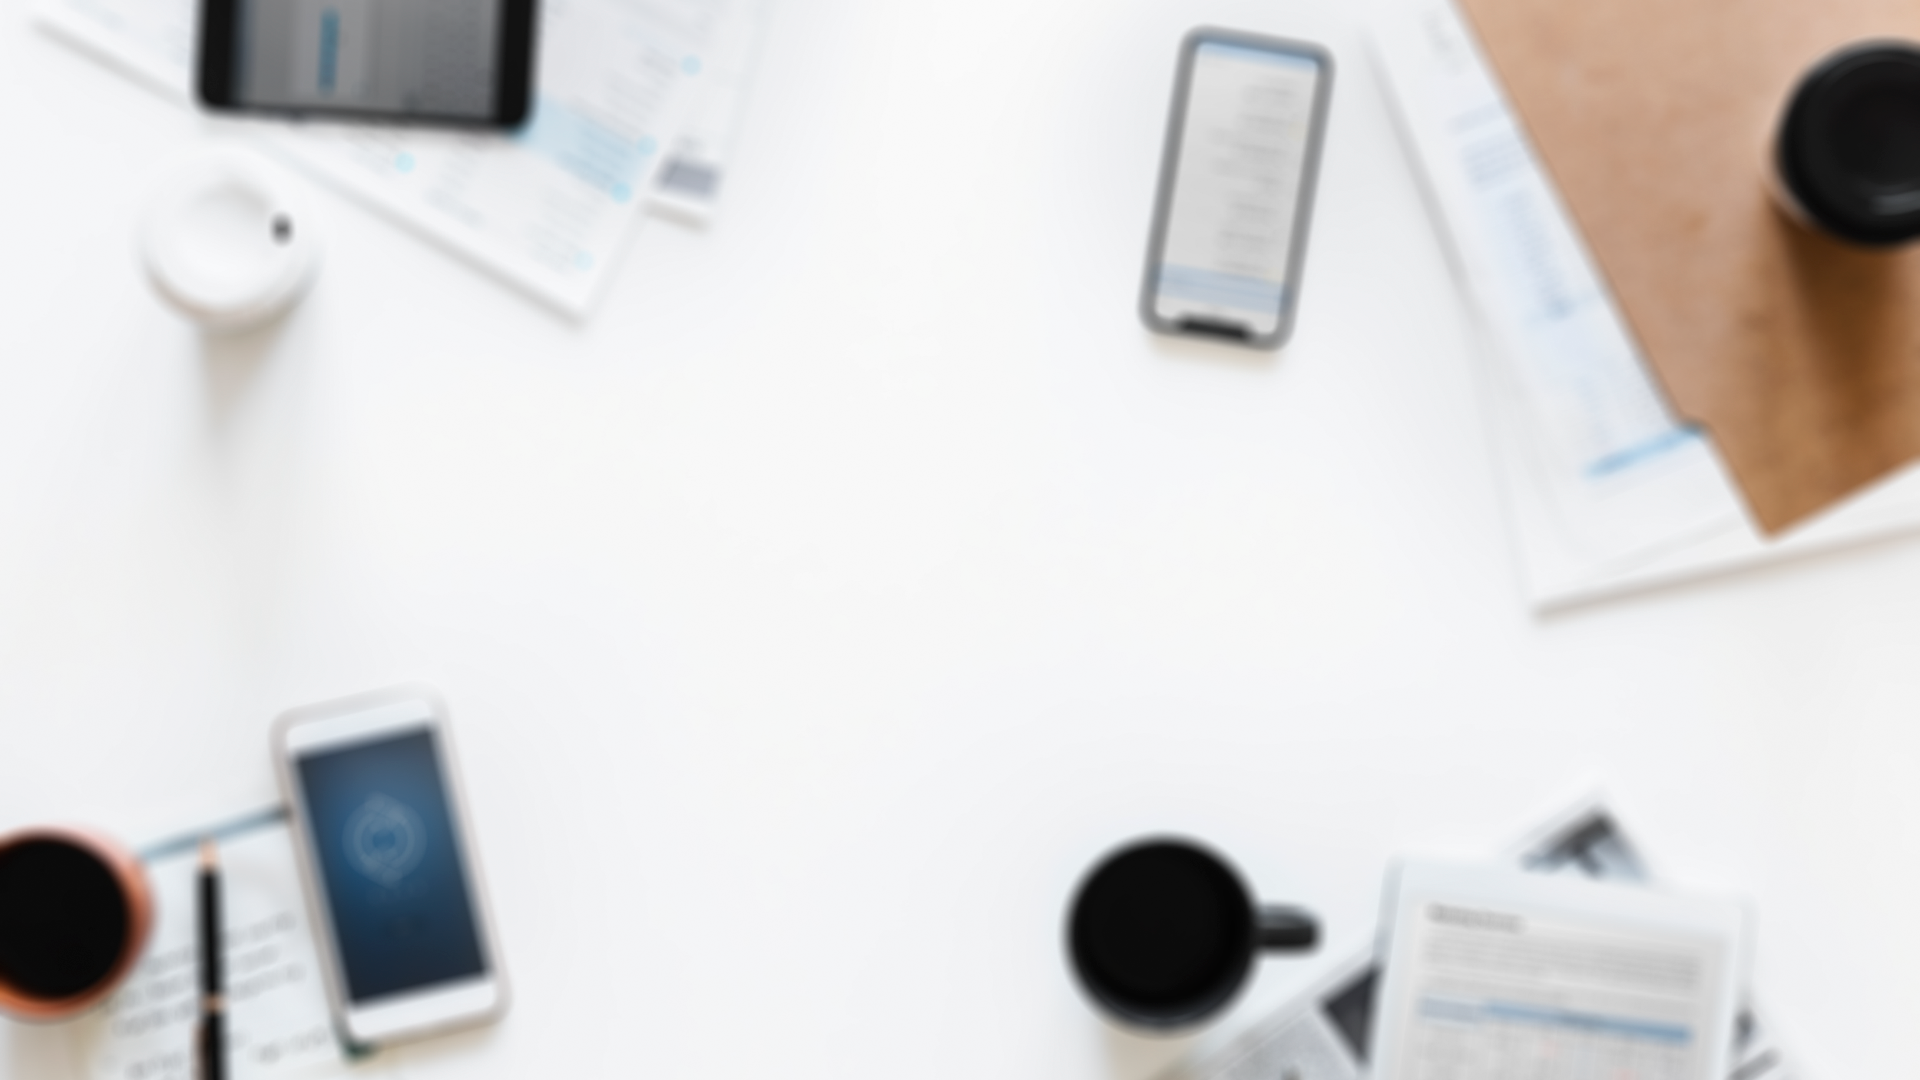 - BEAM (Broadband for E-Business & Marketing)provides funding opportunity for small & medium-sized enterprises/businesses